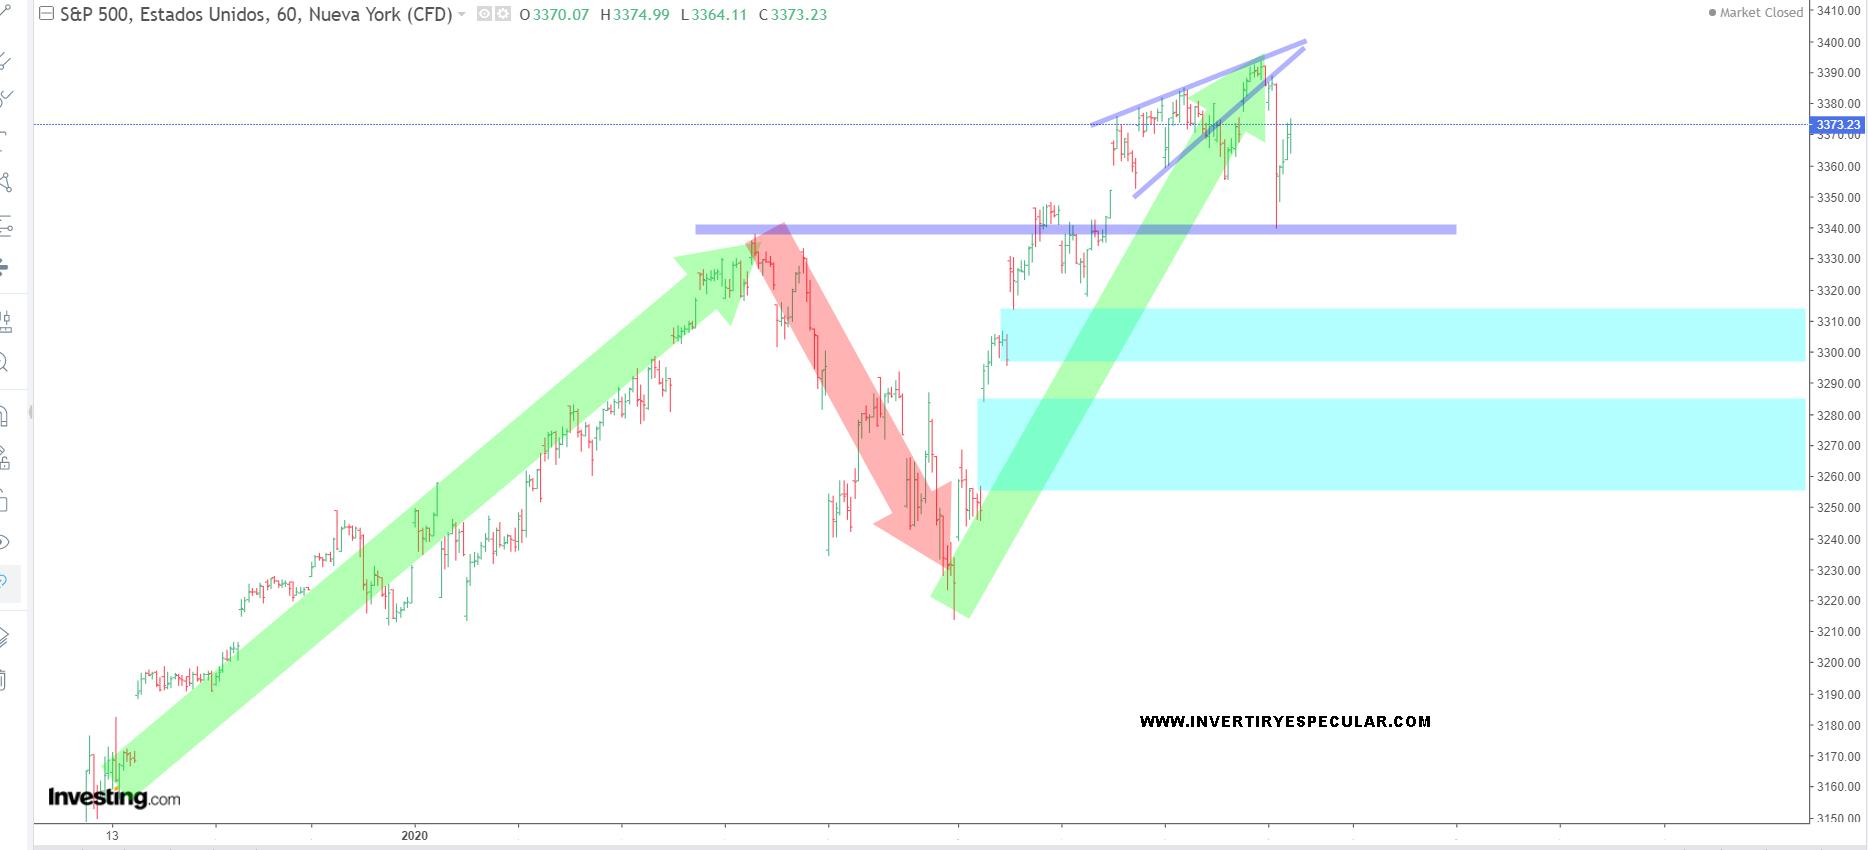 Up again en Wall Street